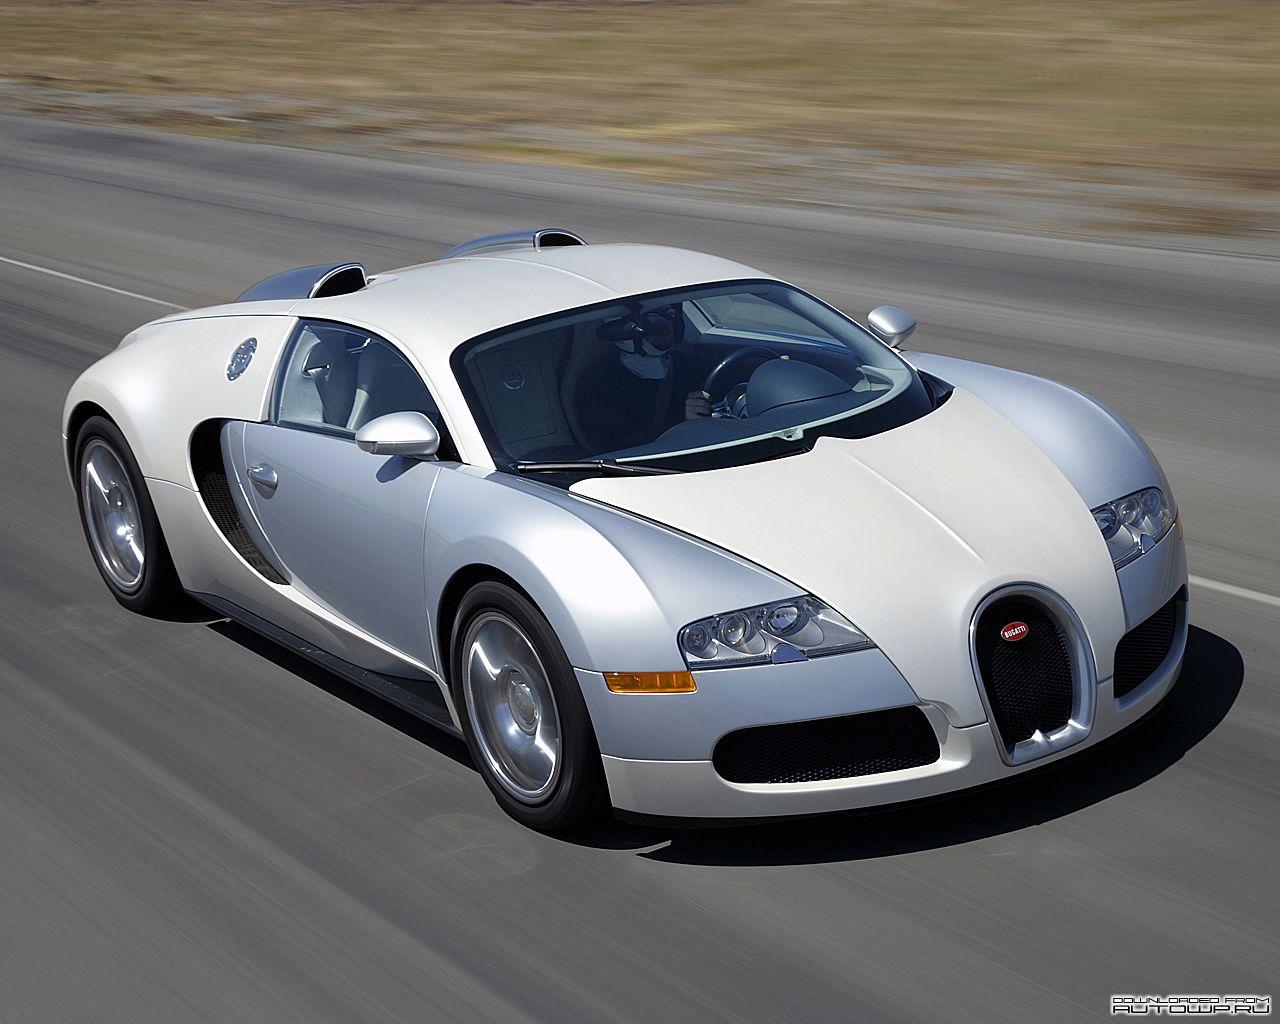 Bugatti Veyron Bugatti Veyron Bugatti Bugatti Chiron